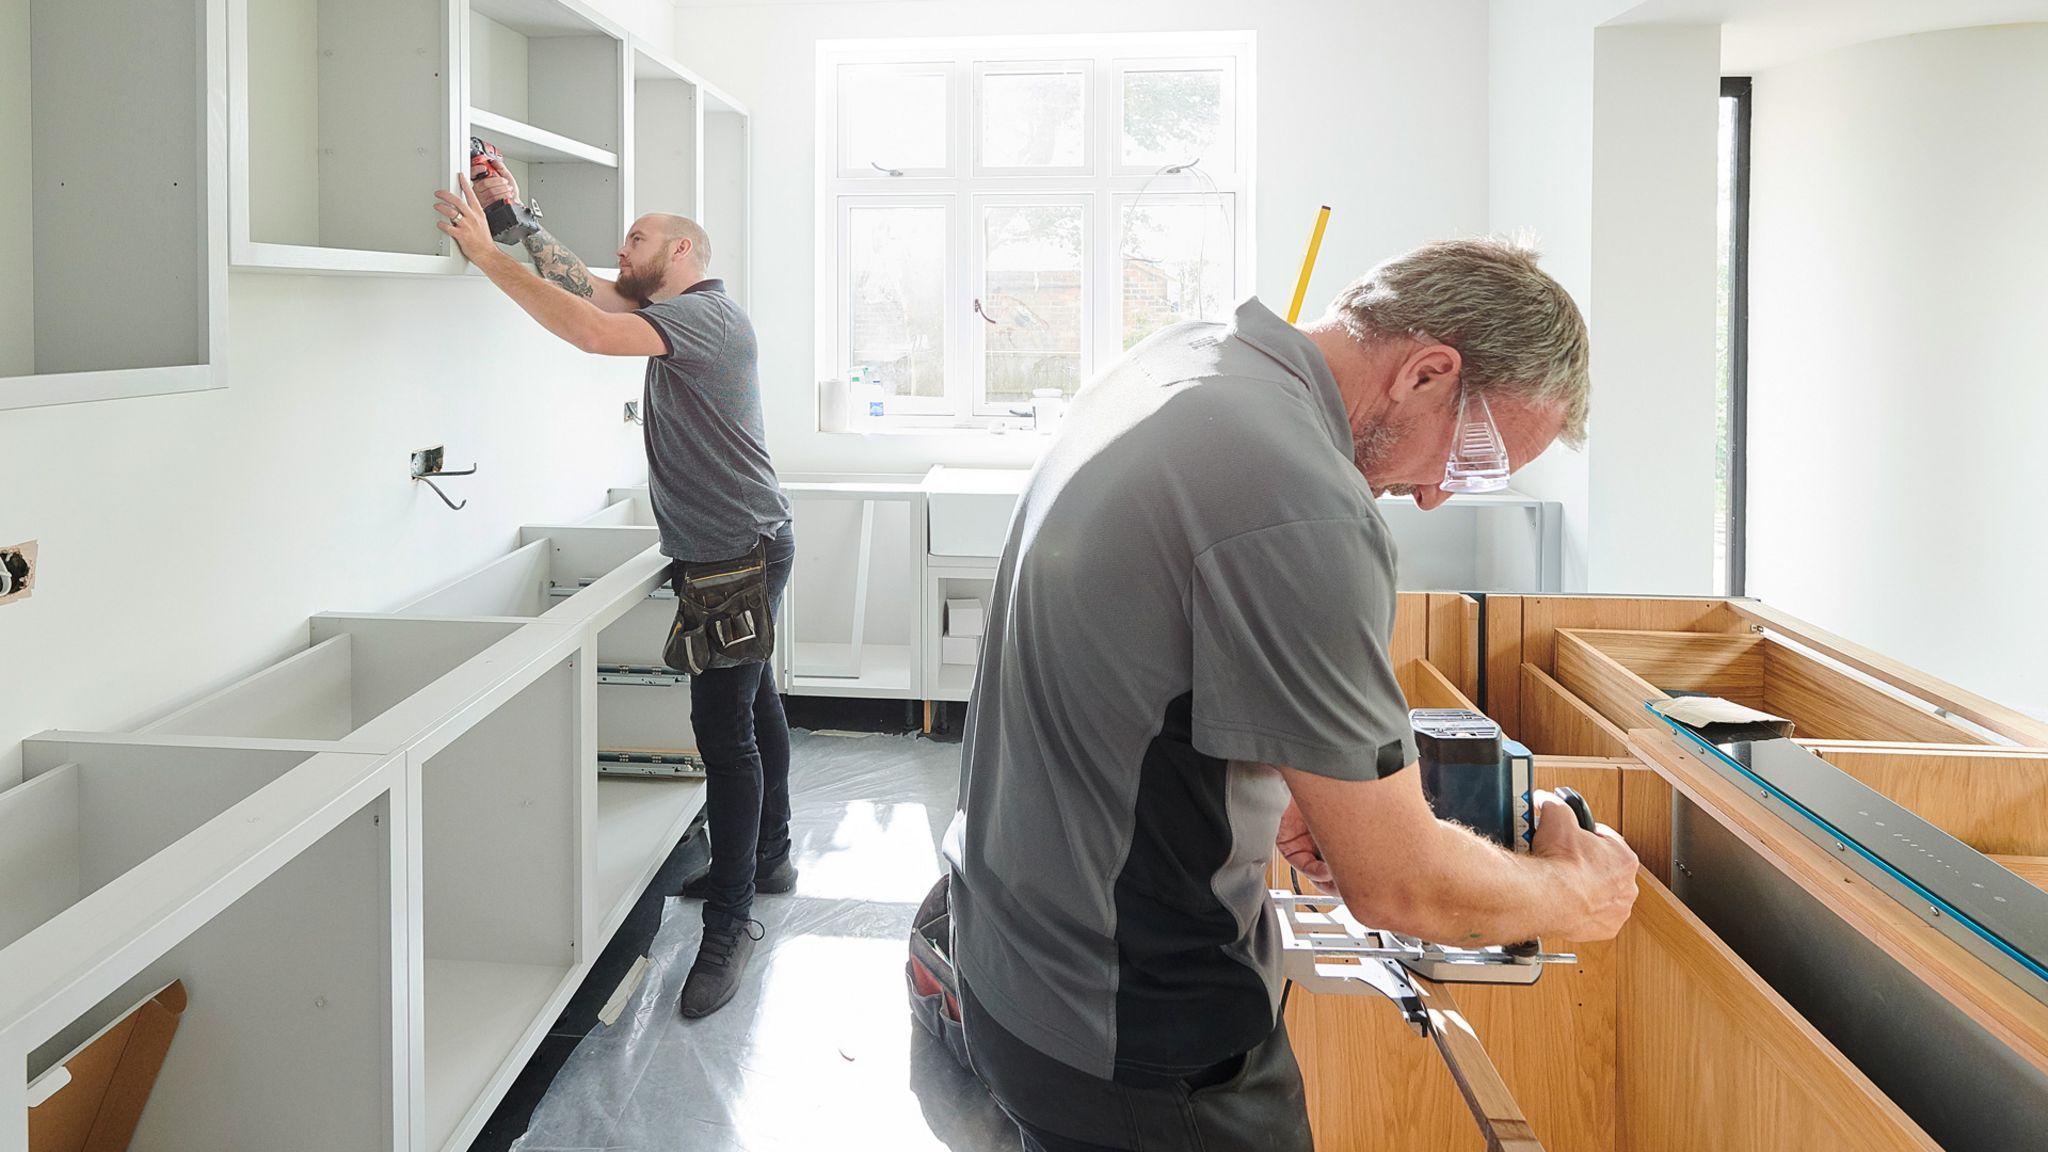 Two men fitting a kitchen